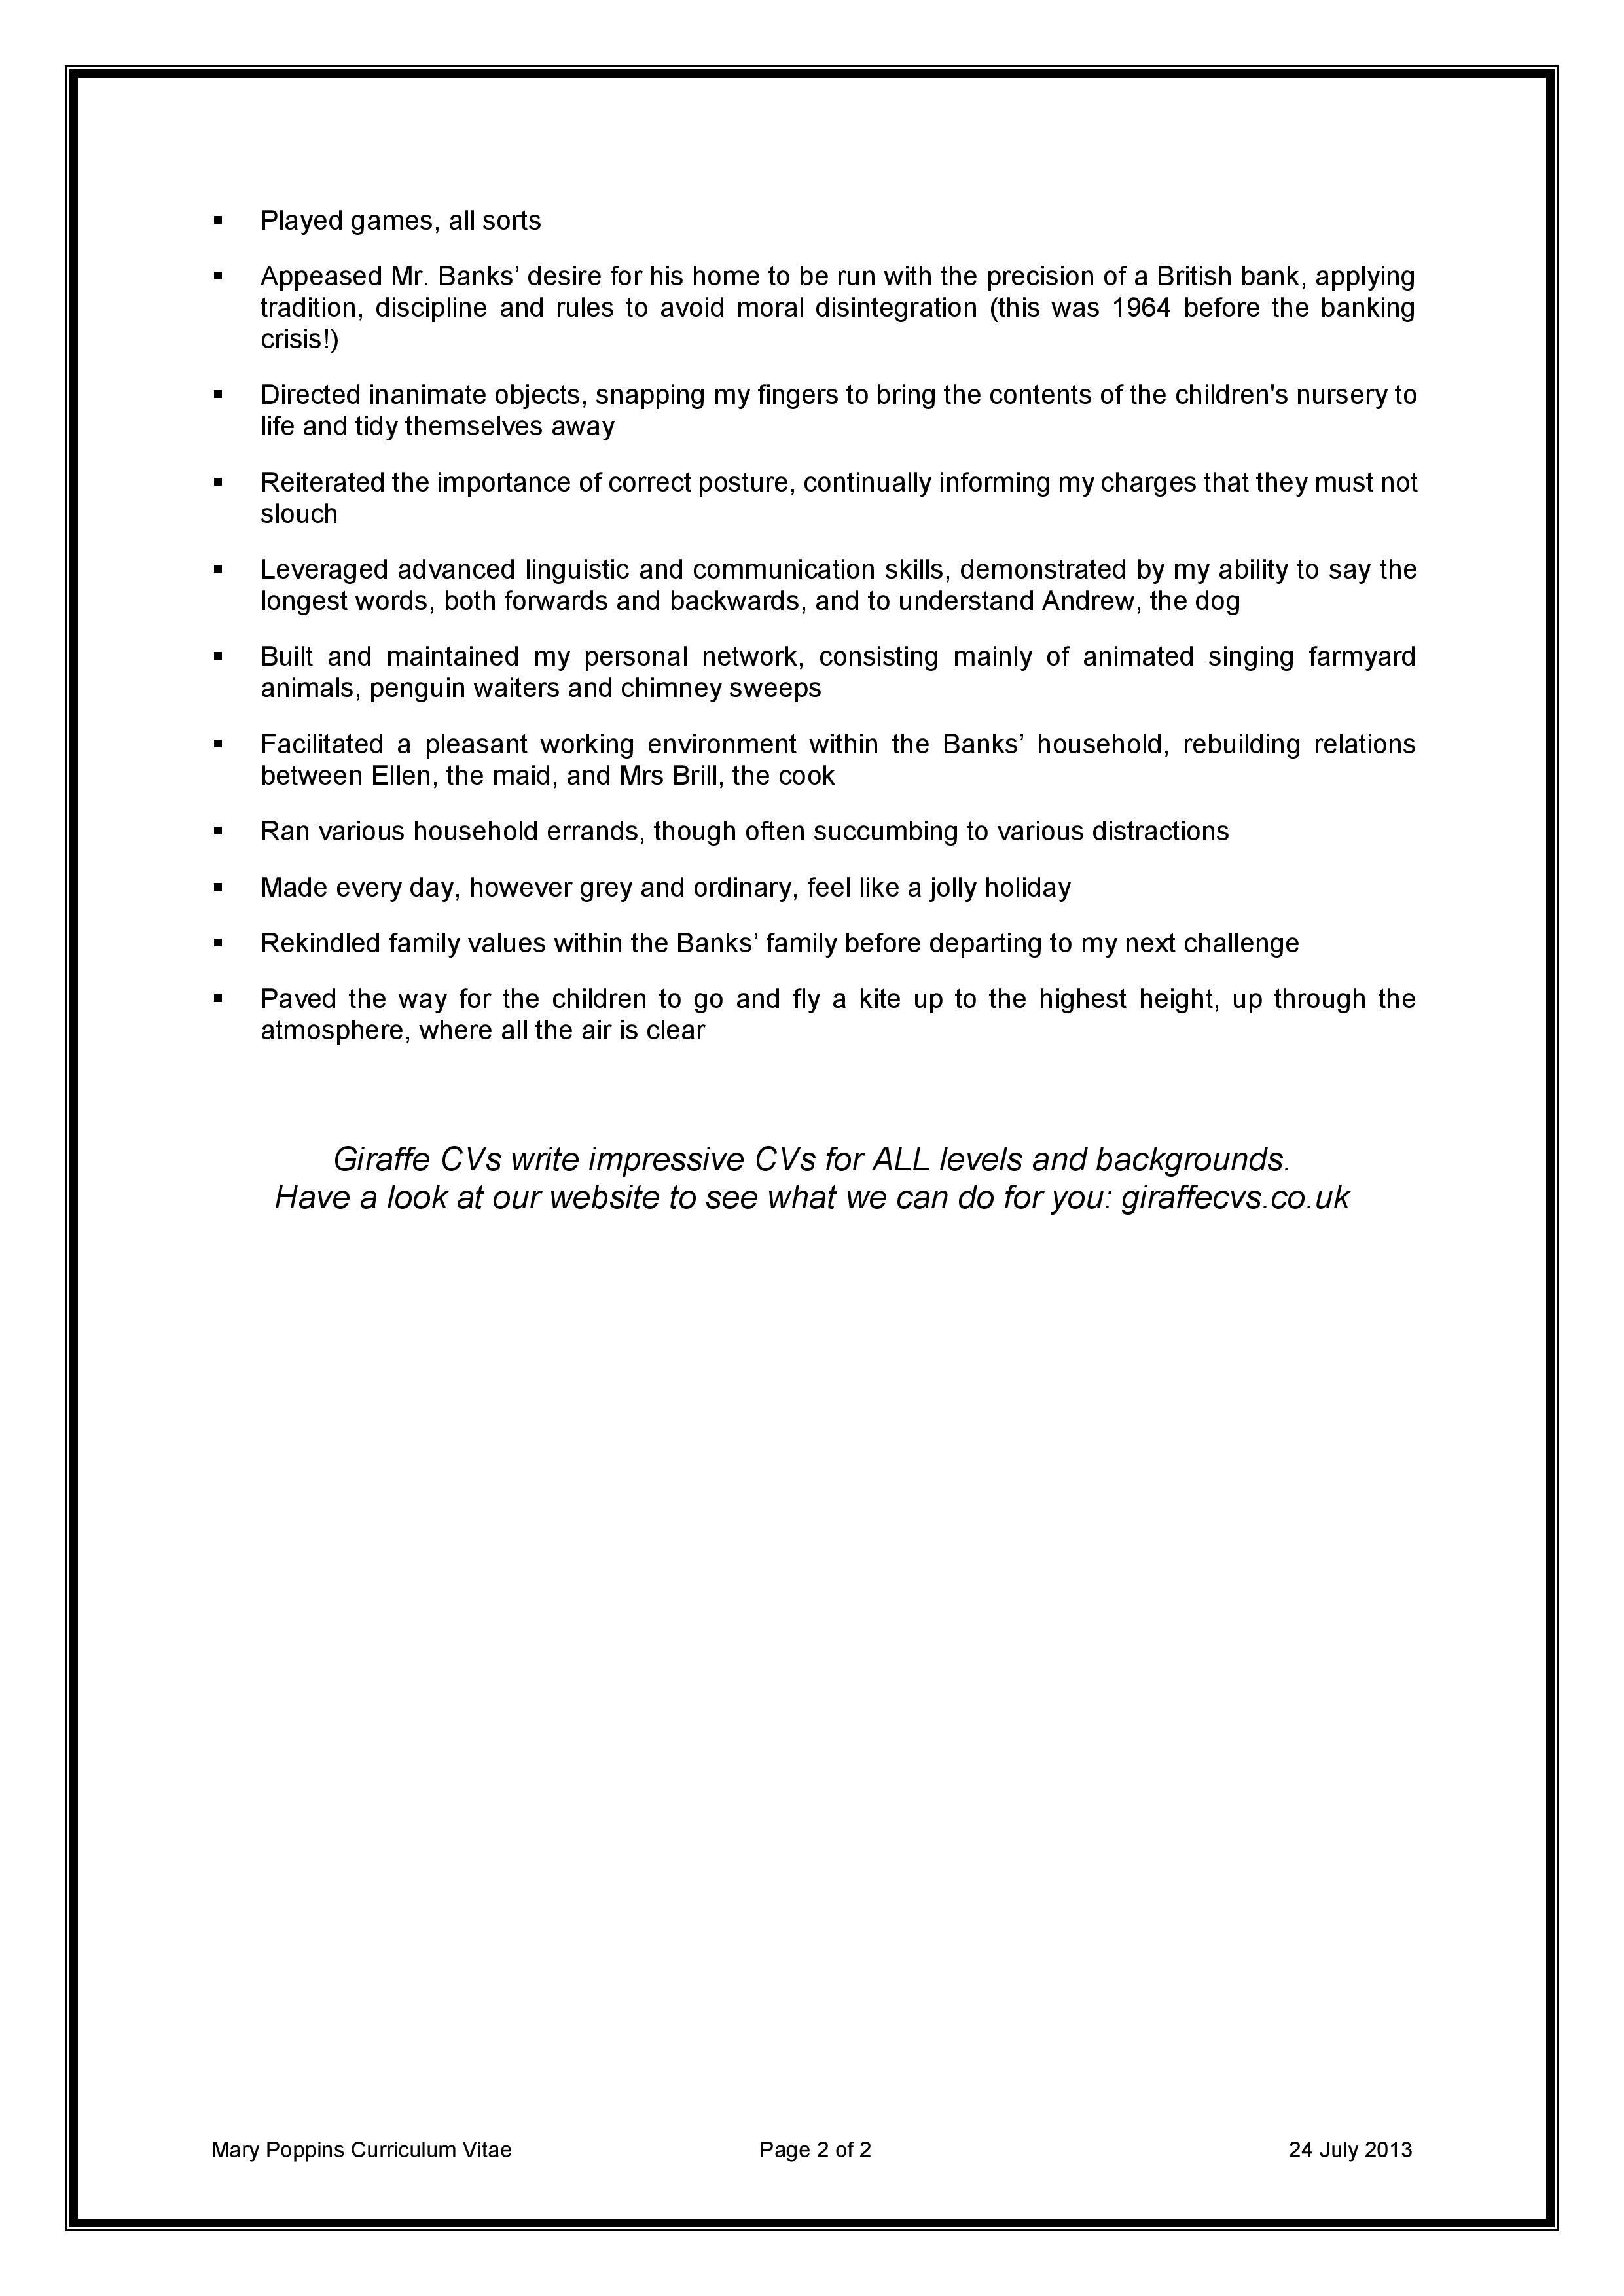 proper resume how to make a proper resume format how to make a     cover letter esl teacher  merchandiser cover letter sample     Babysitter Resume Sample Resume Template F ltqtsy